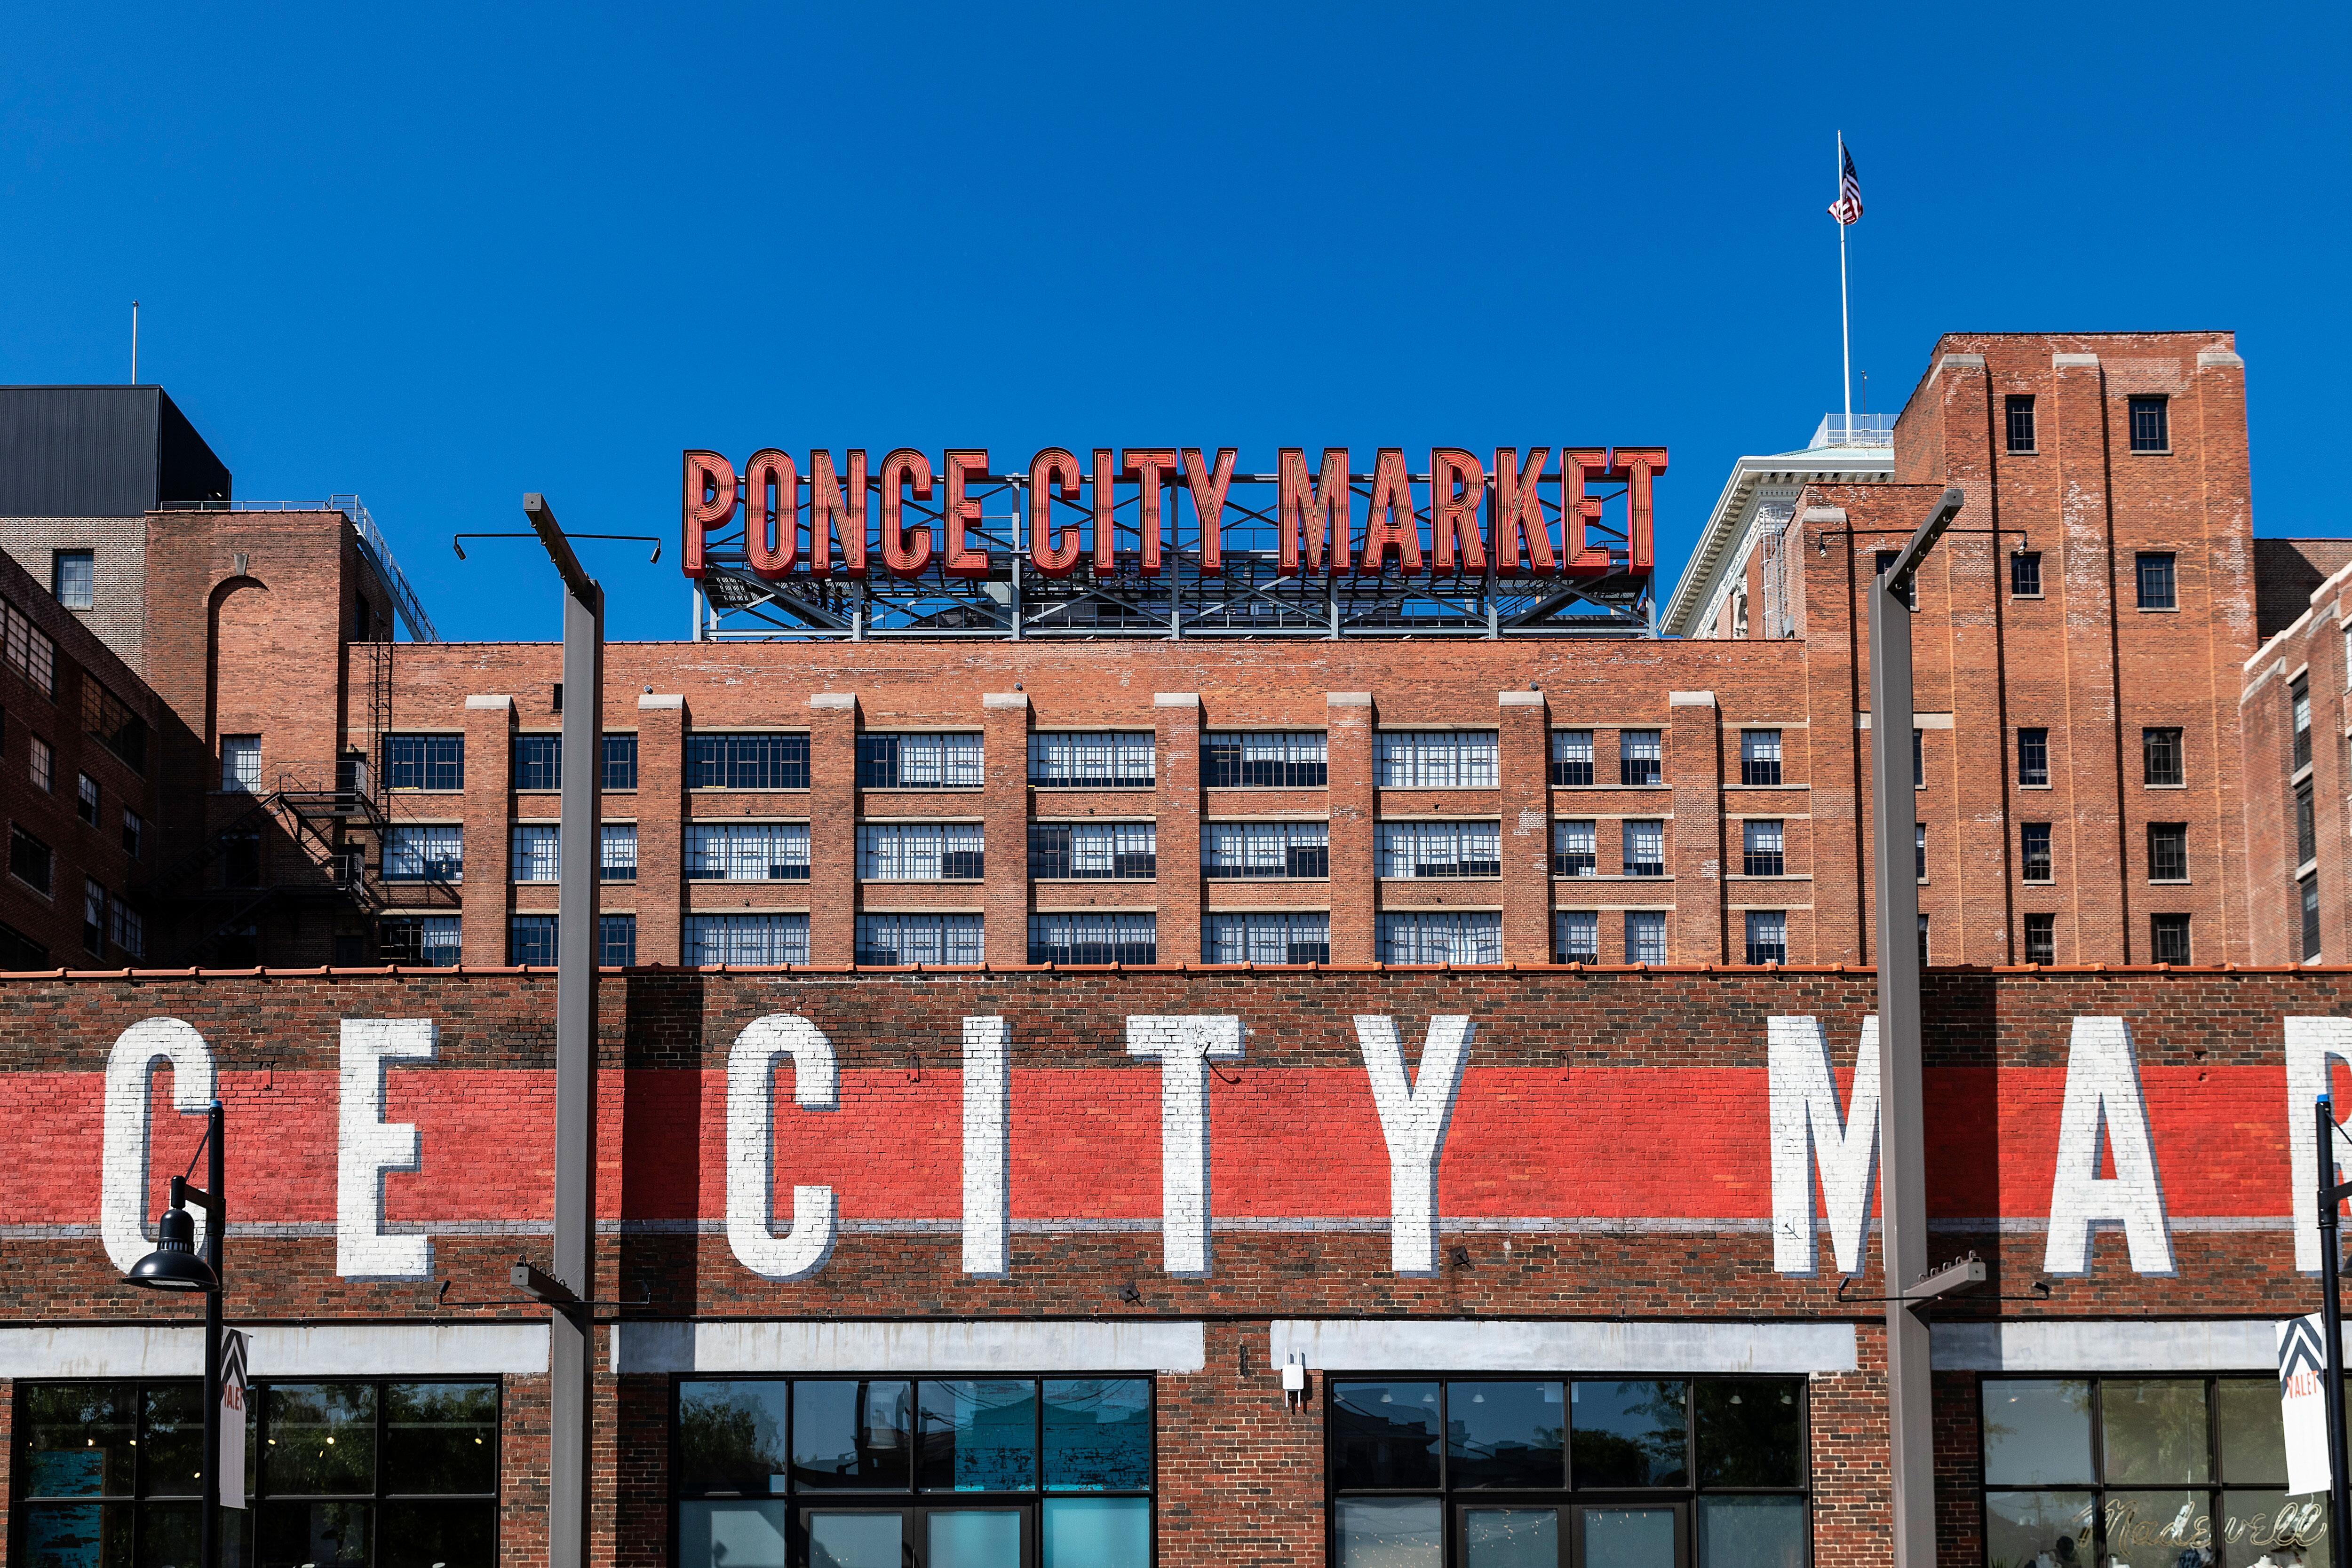 Ponce City Market Sign